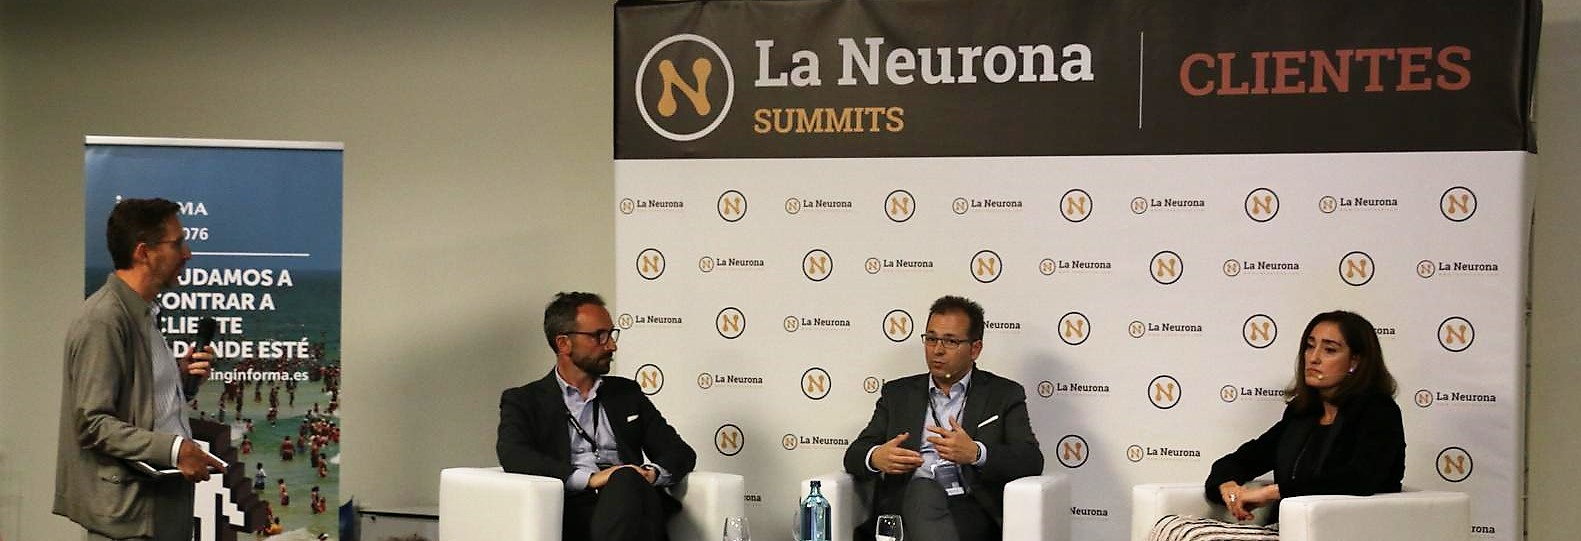 La Neurona Summit Clientes Barcelona - Mesa sobre Social Selling